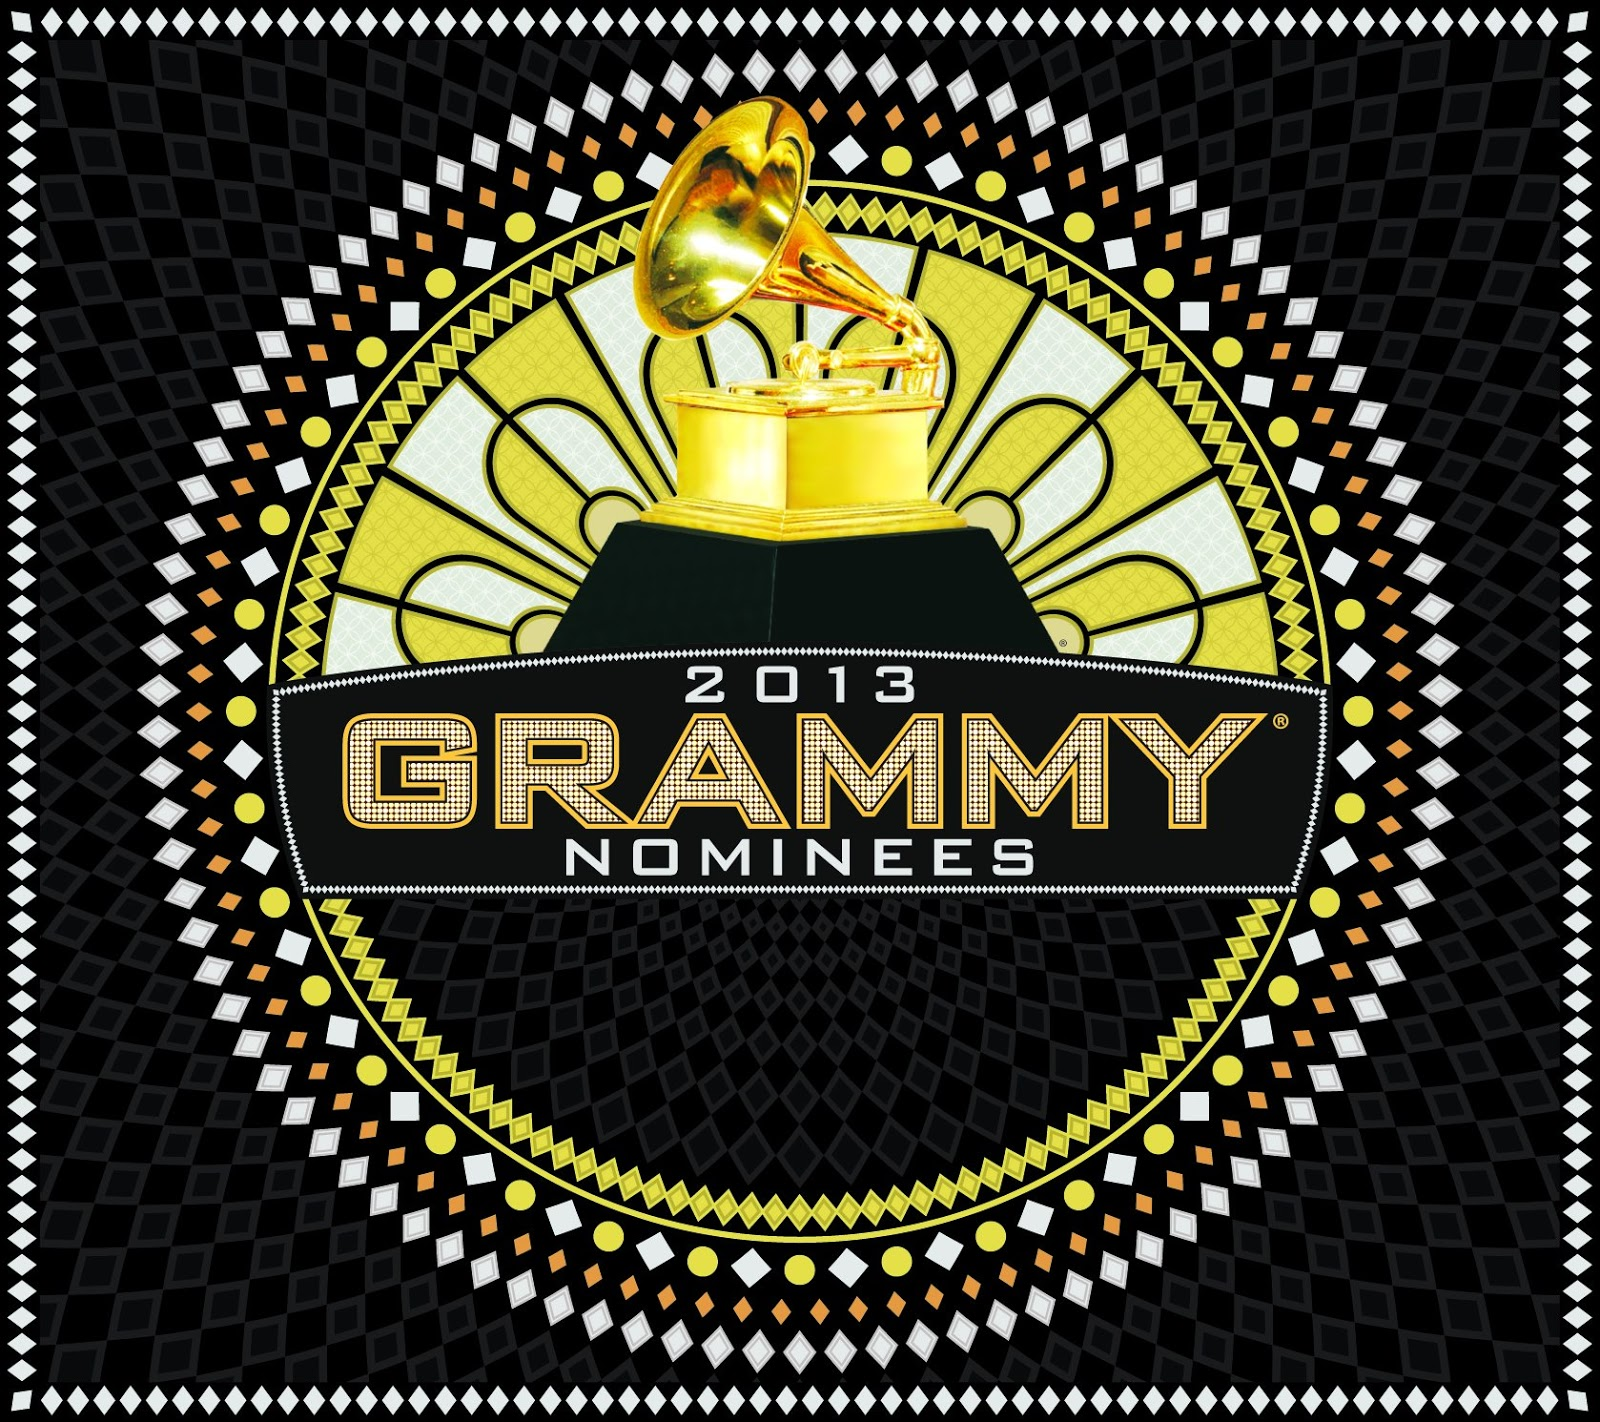 http://3.bp.blogspot.com/-PWyKqT5RypU/UQLNsPqicKI/AAAAAAAANO8/kq6x5HIfQmw/s1600/2013-Grammy-Nominees-CountryMusicRocks.net_.jpg